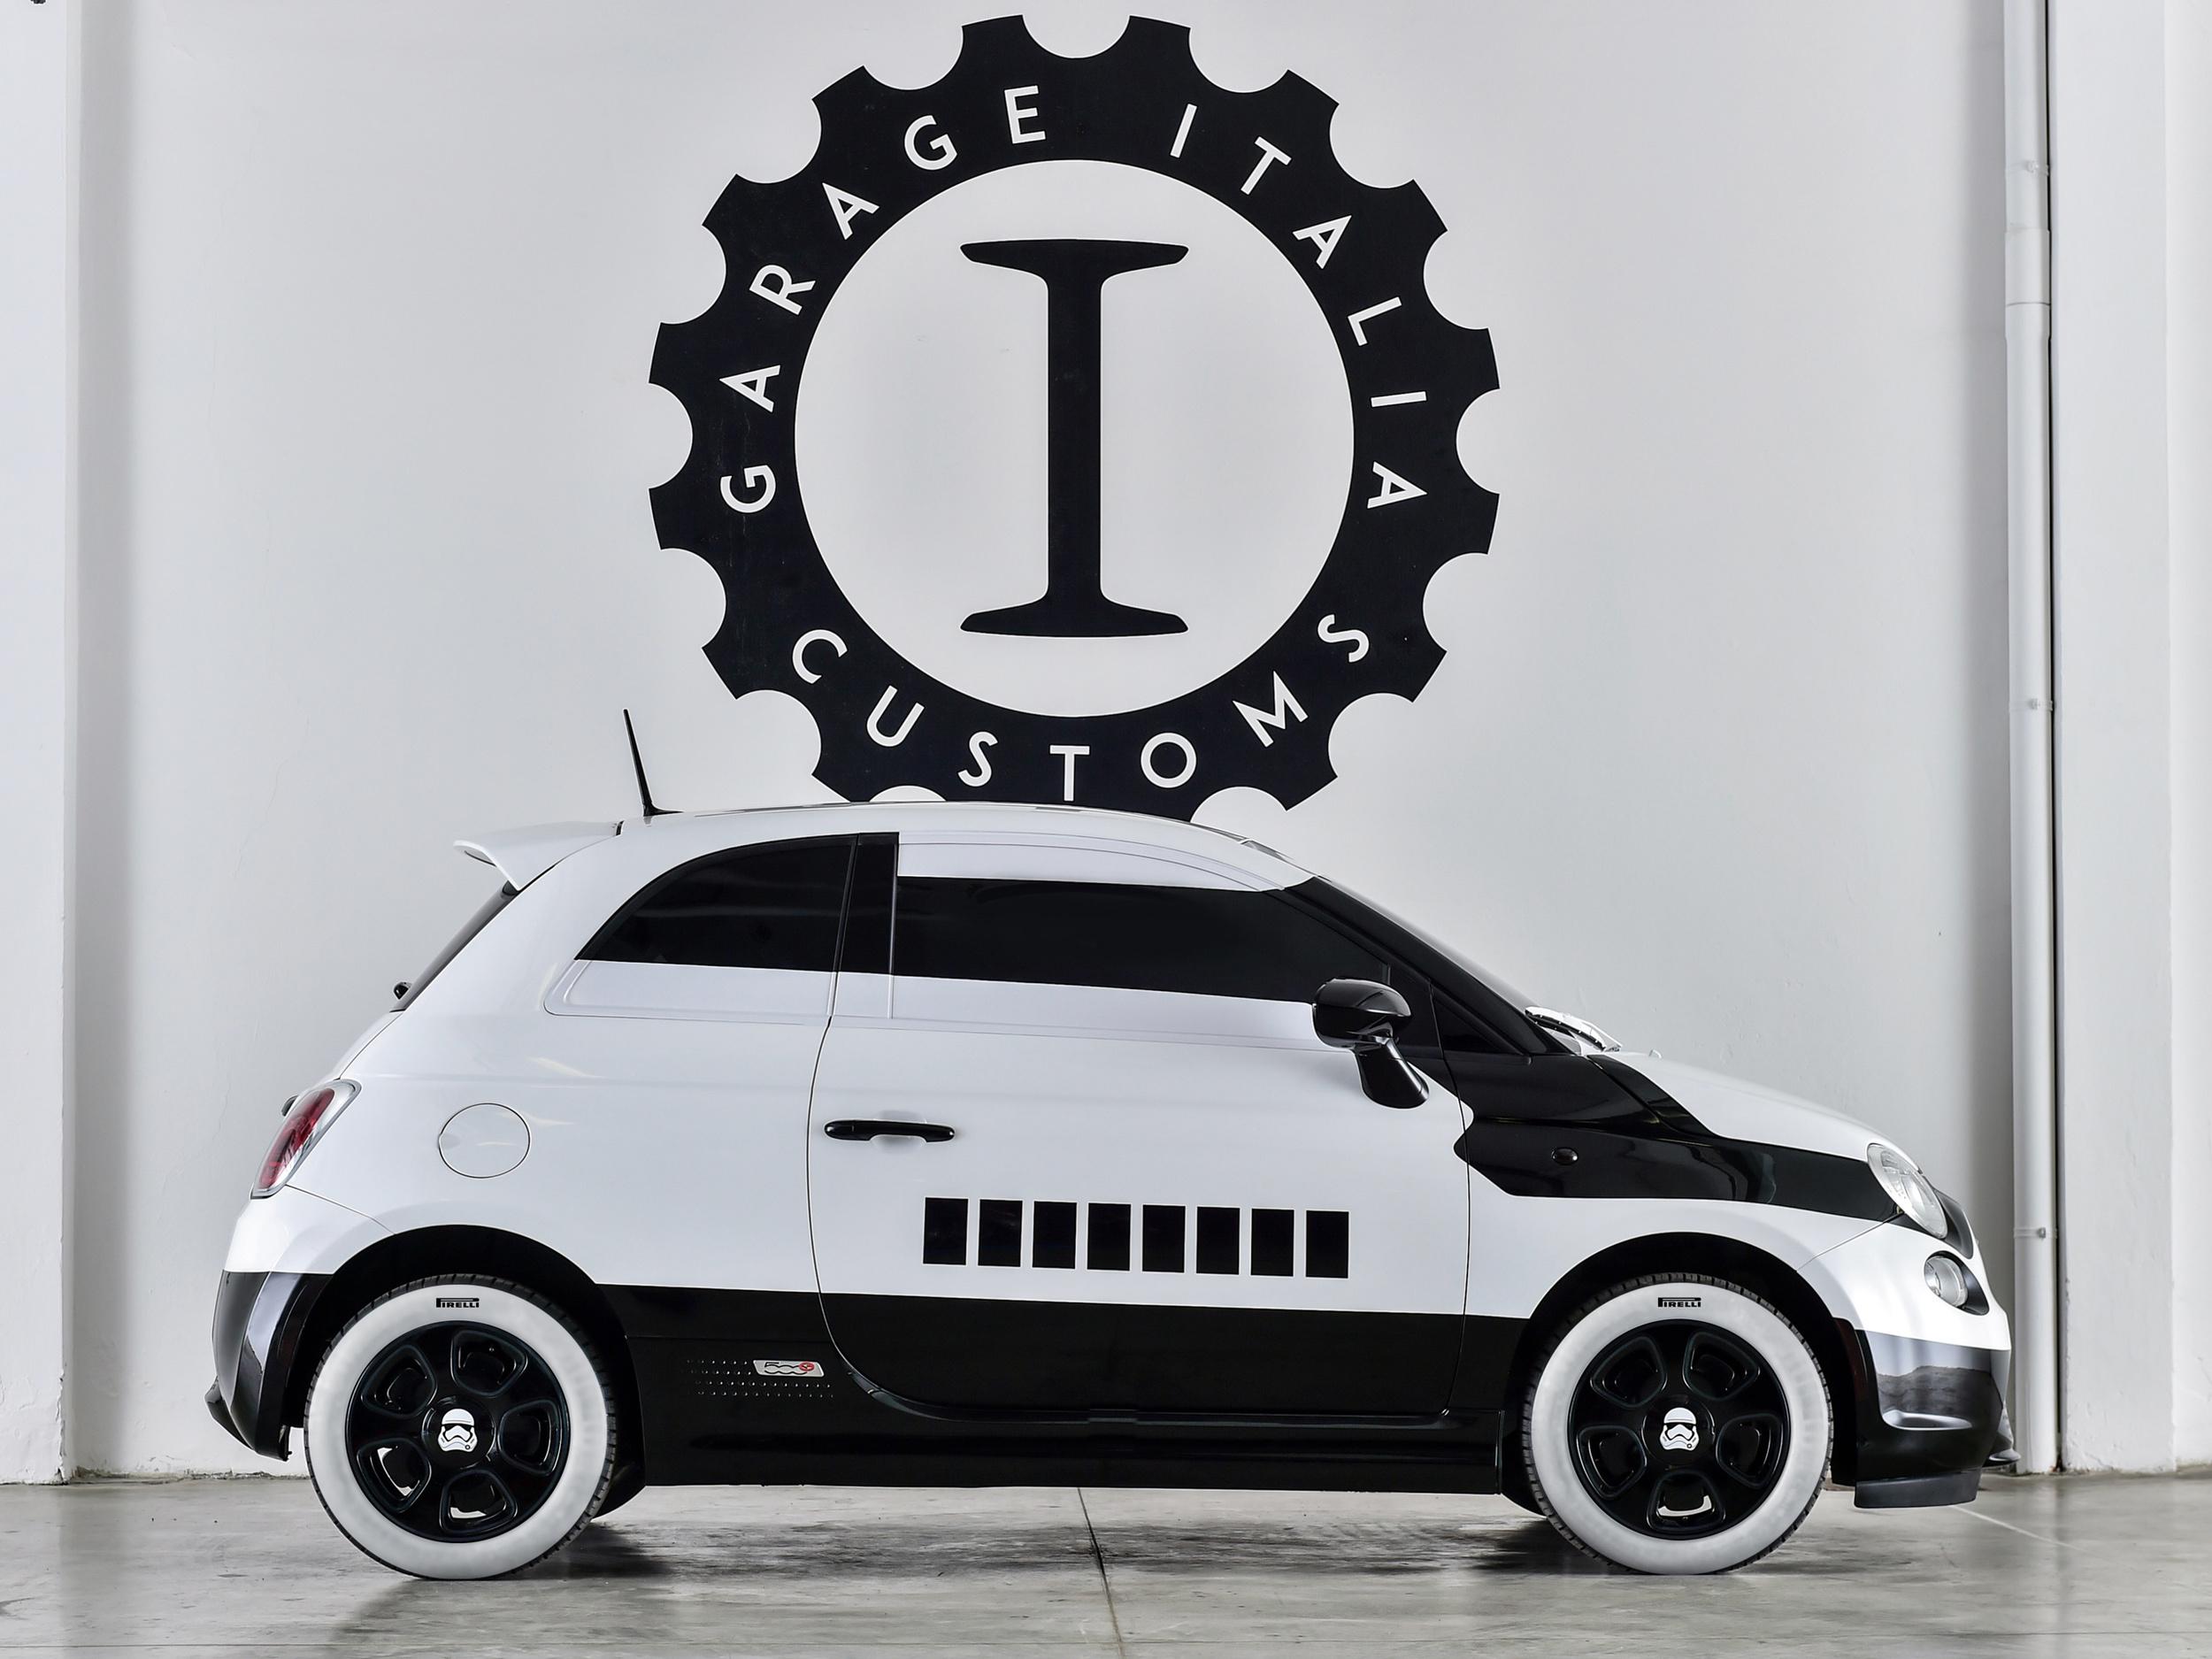 Fiat_500e_stormtrooper1dogesbb835f3r0a8jlffrcrcbt.jpg